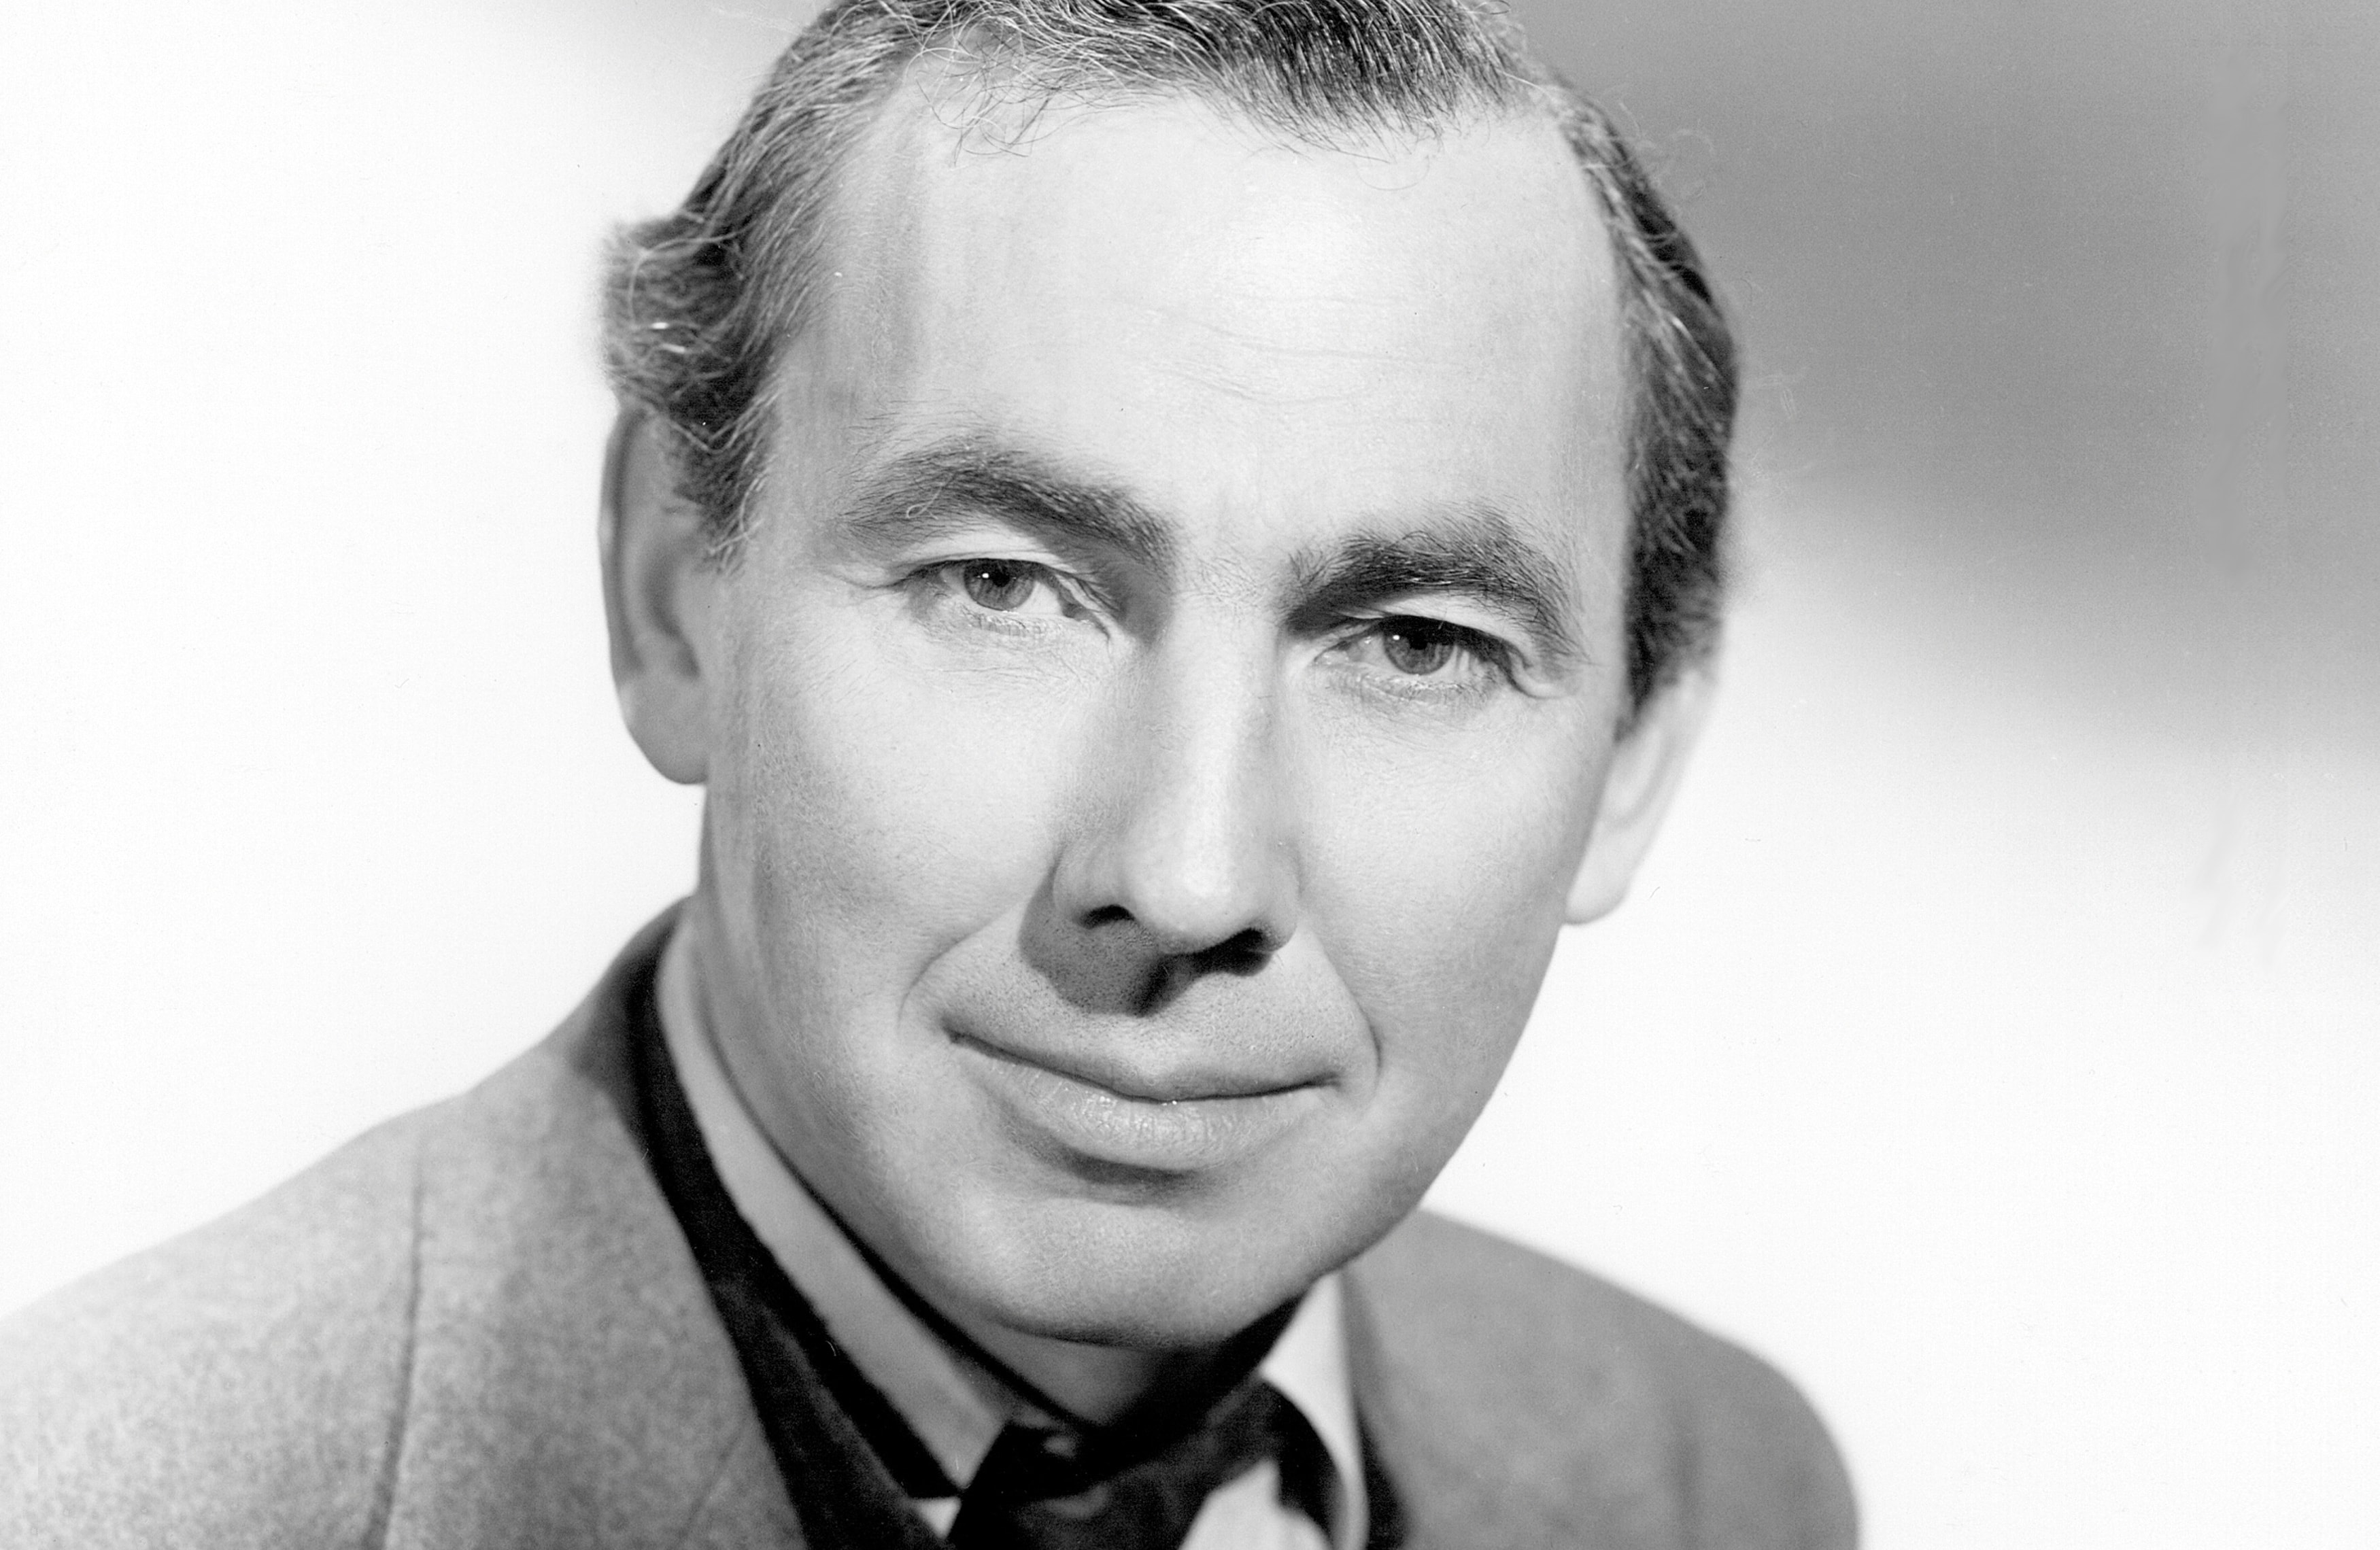 Zoltan Korda